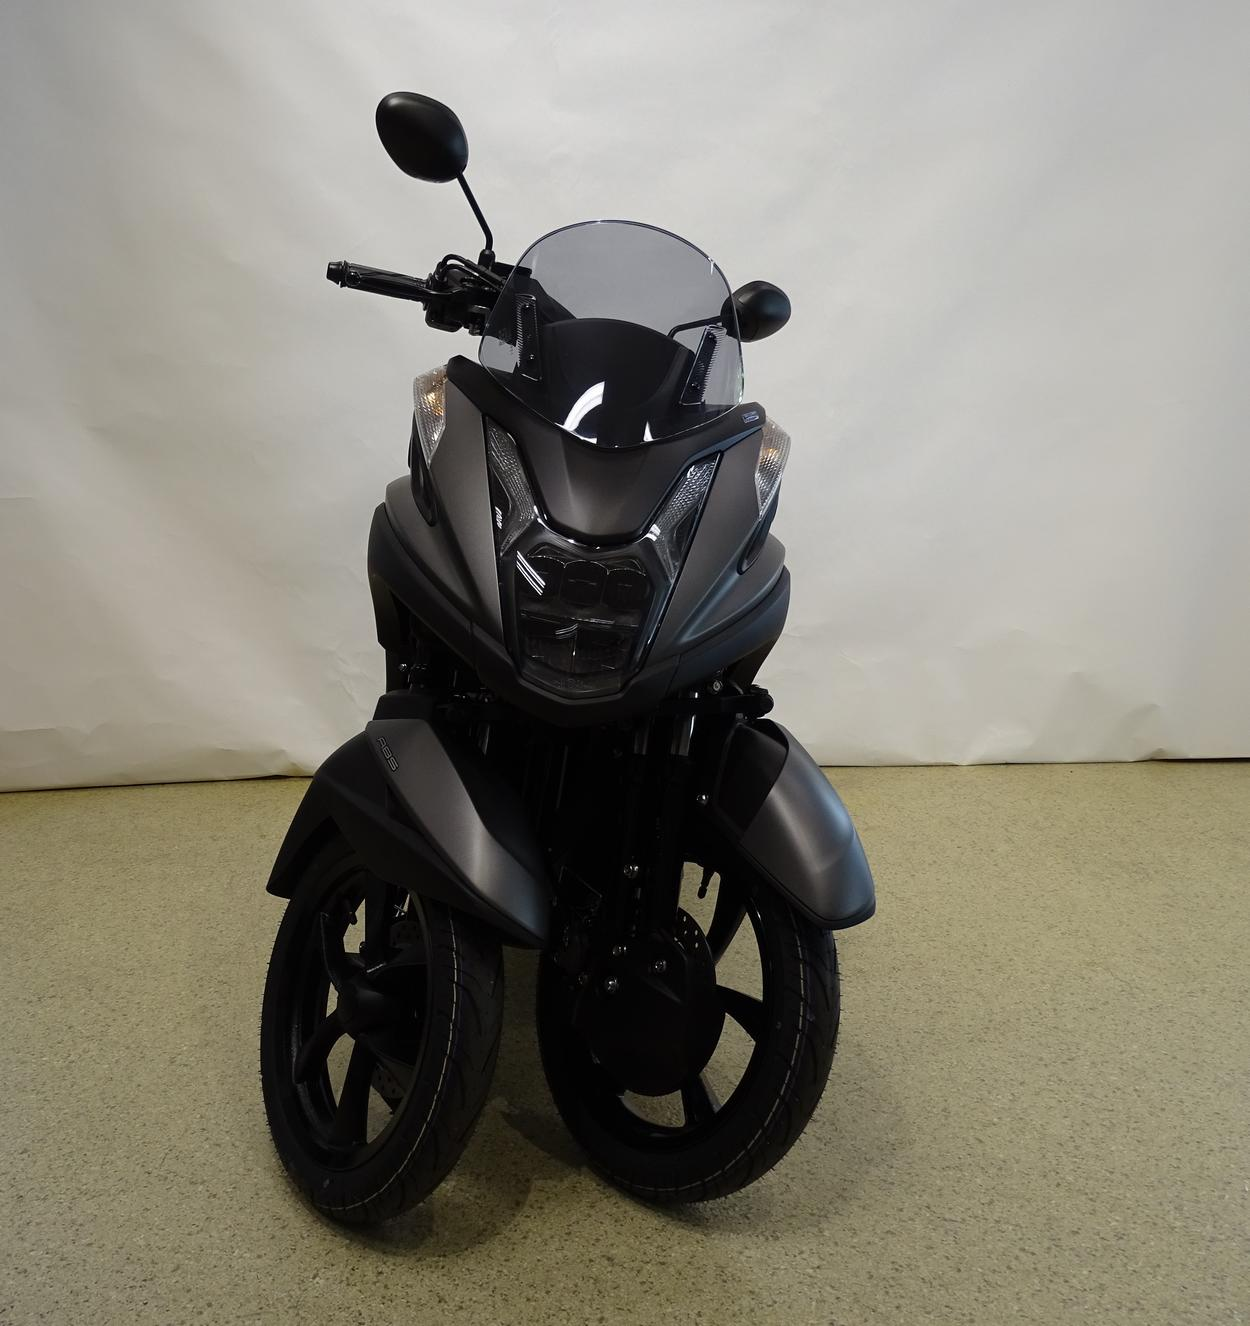 YAMAHA - MW125 Tricity ABS